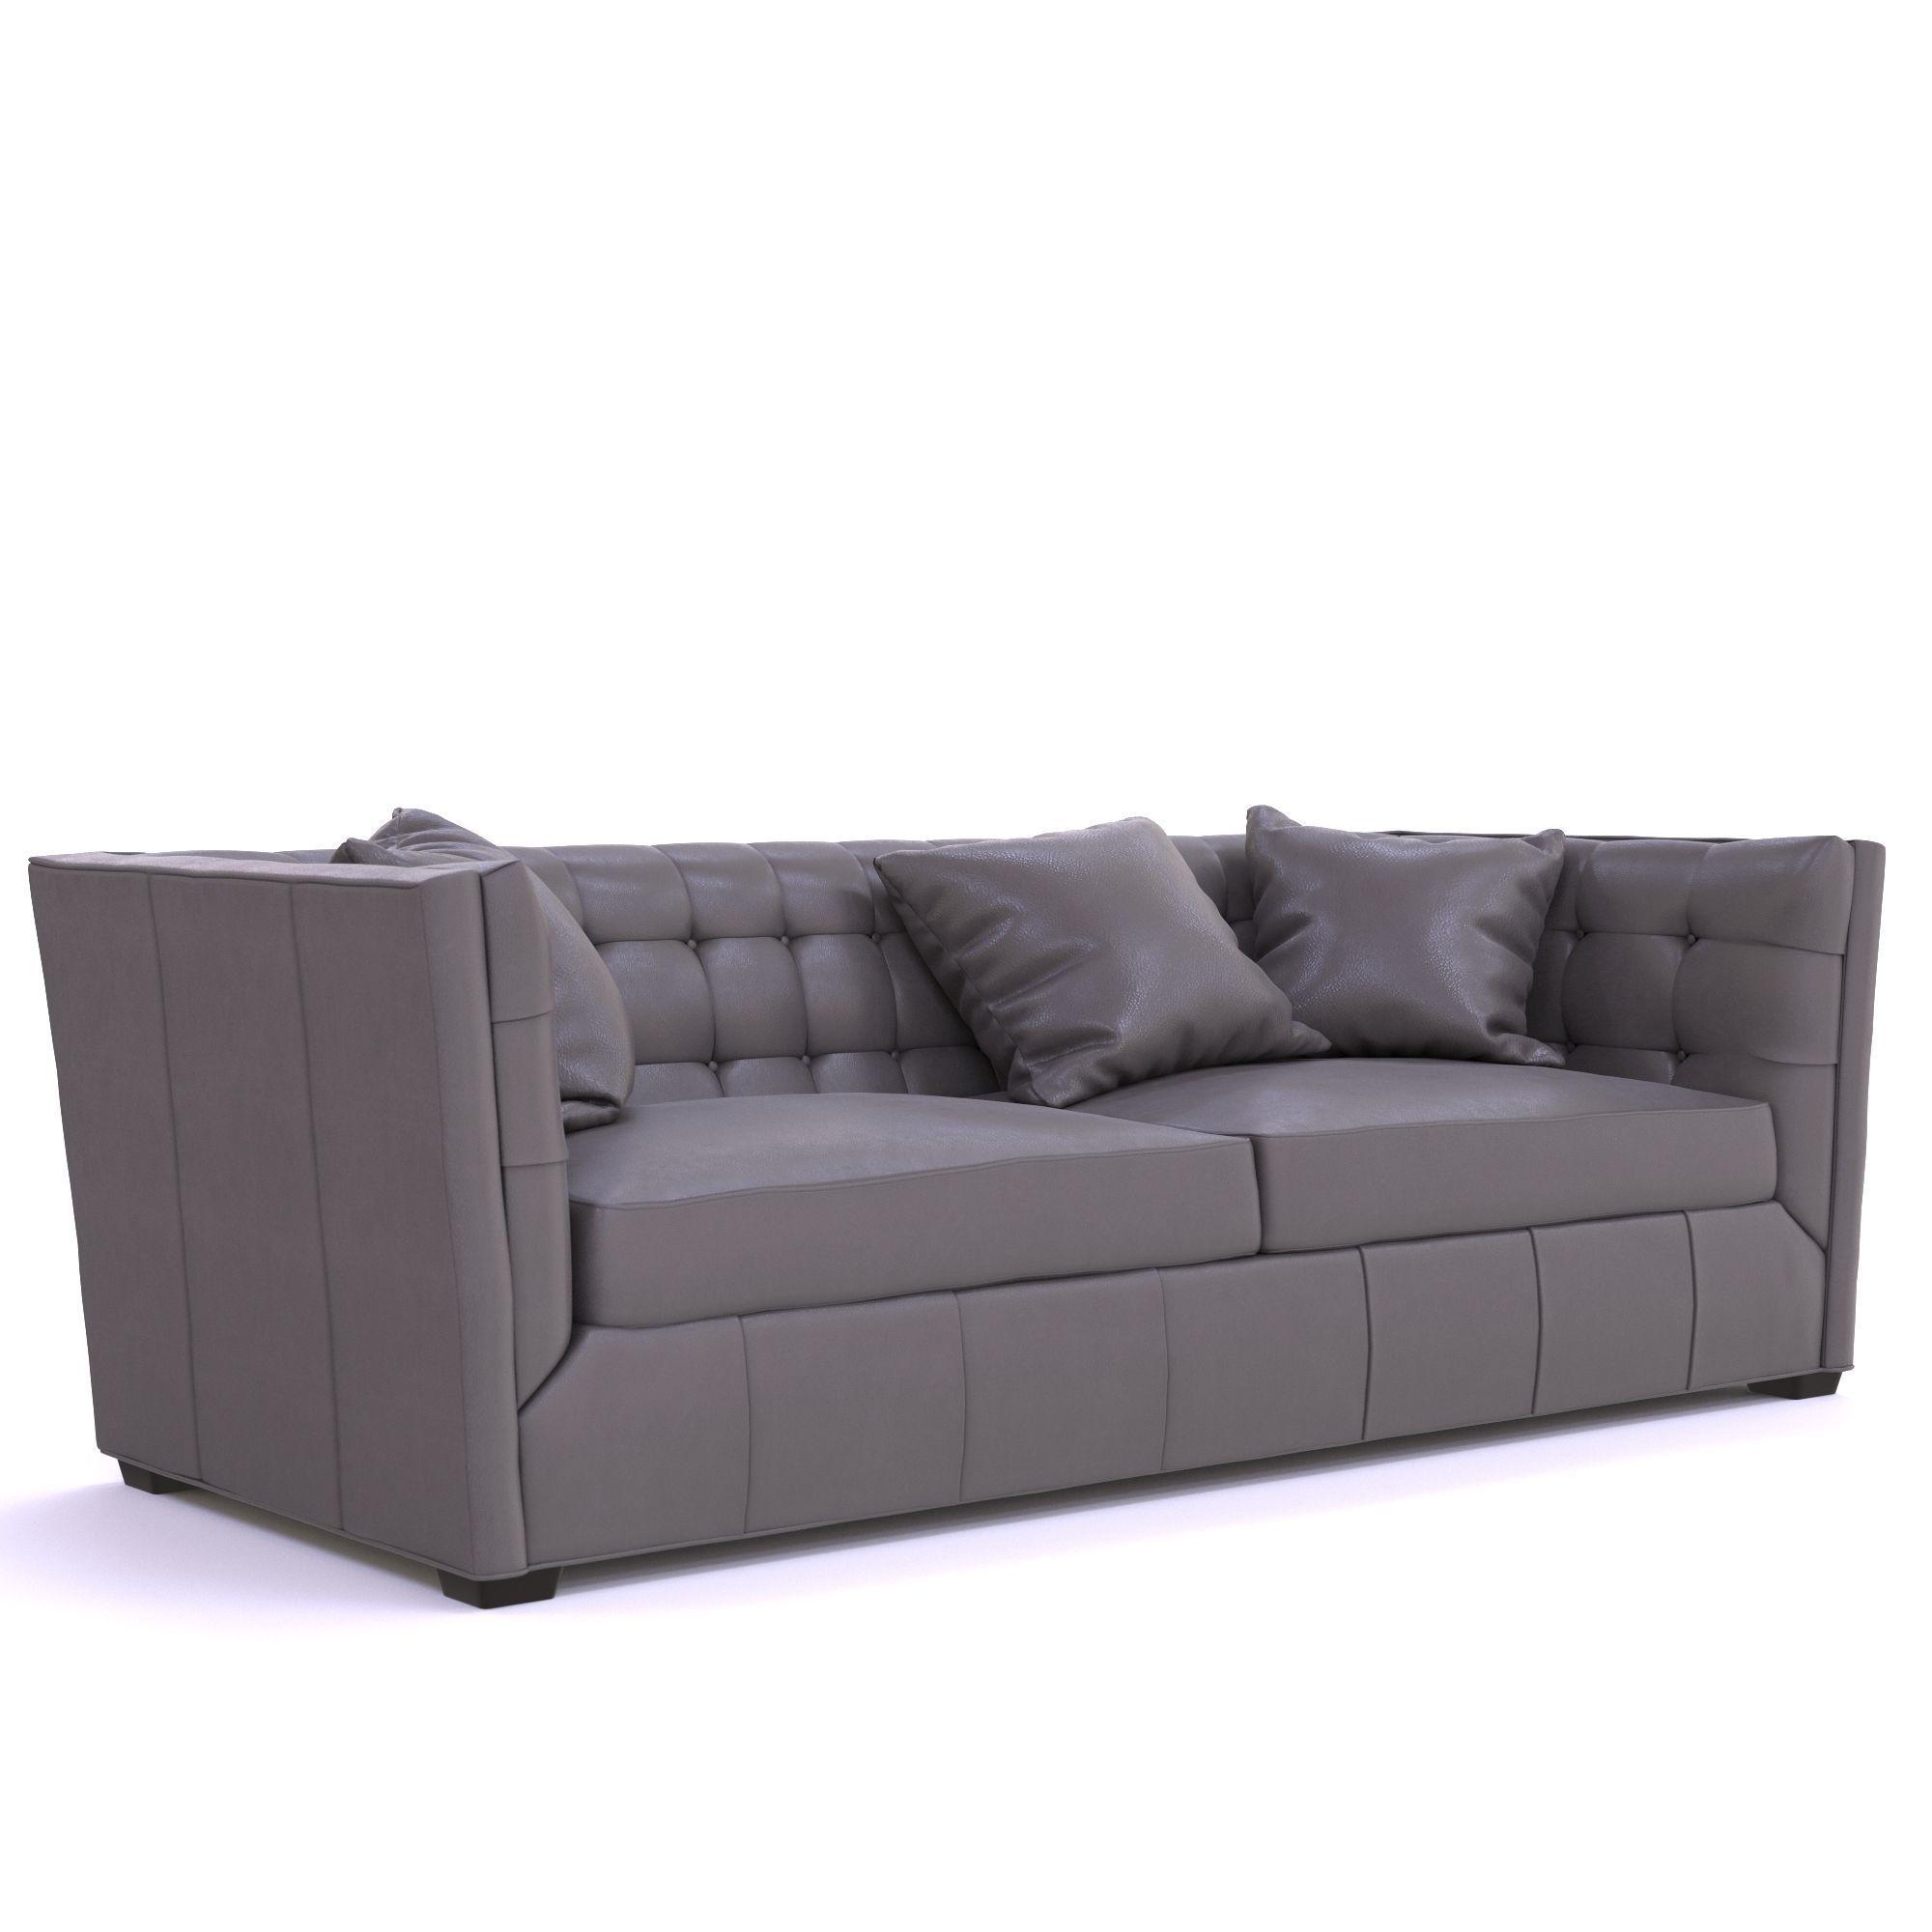 Hayden Tufted Leather Sofa | 3D model